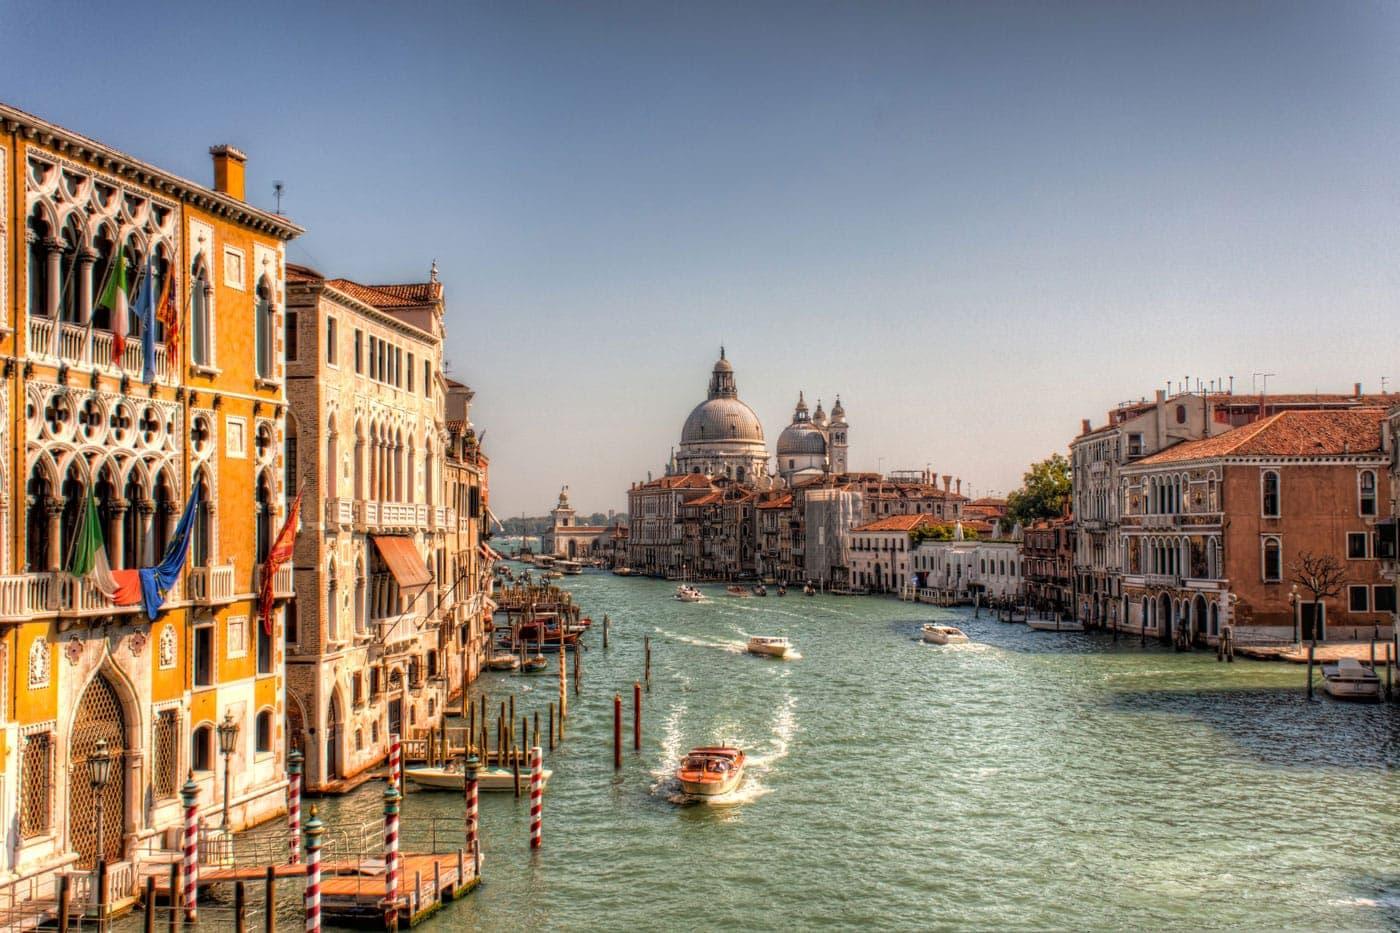 Canal Grande in Venedig - HDR Foto